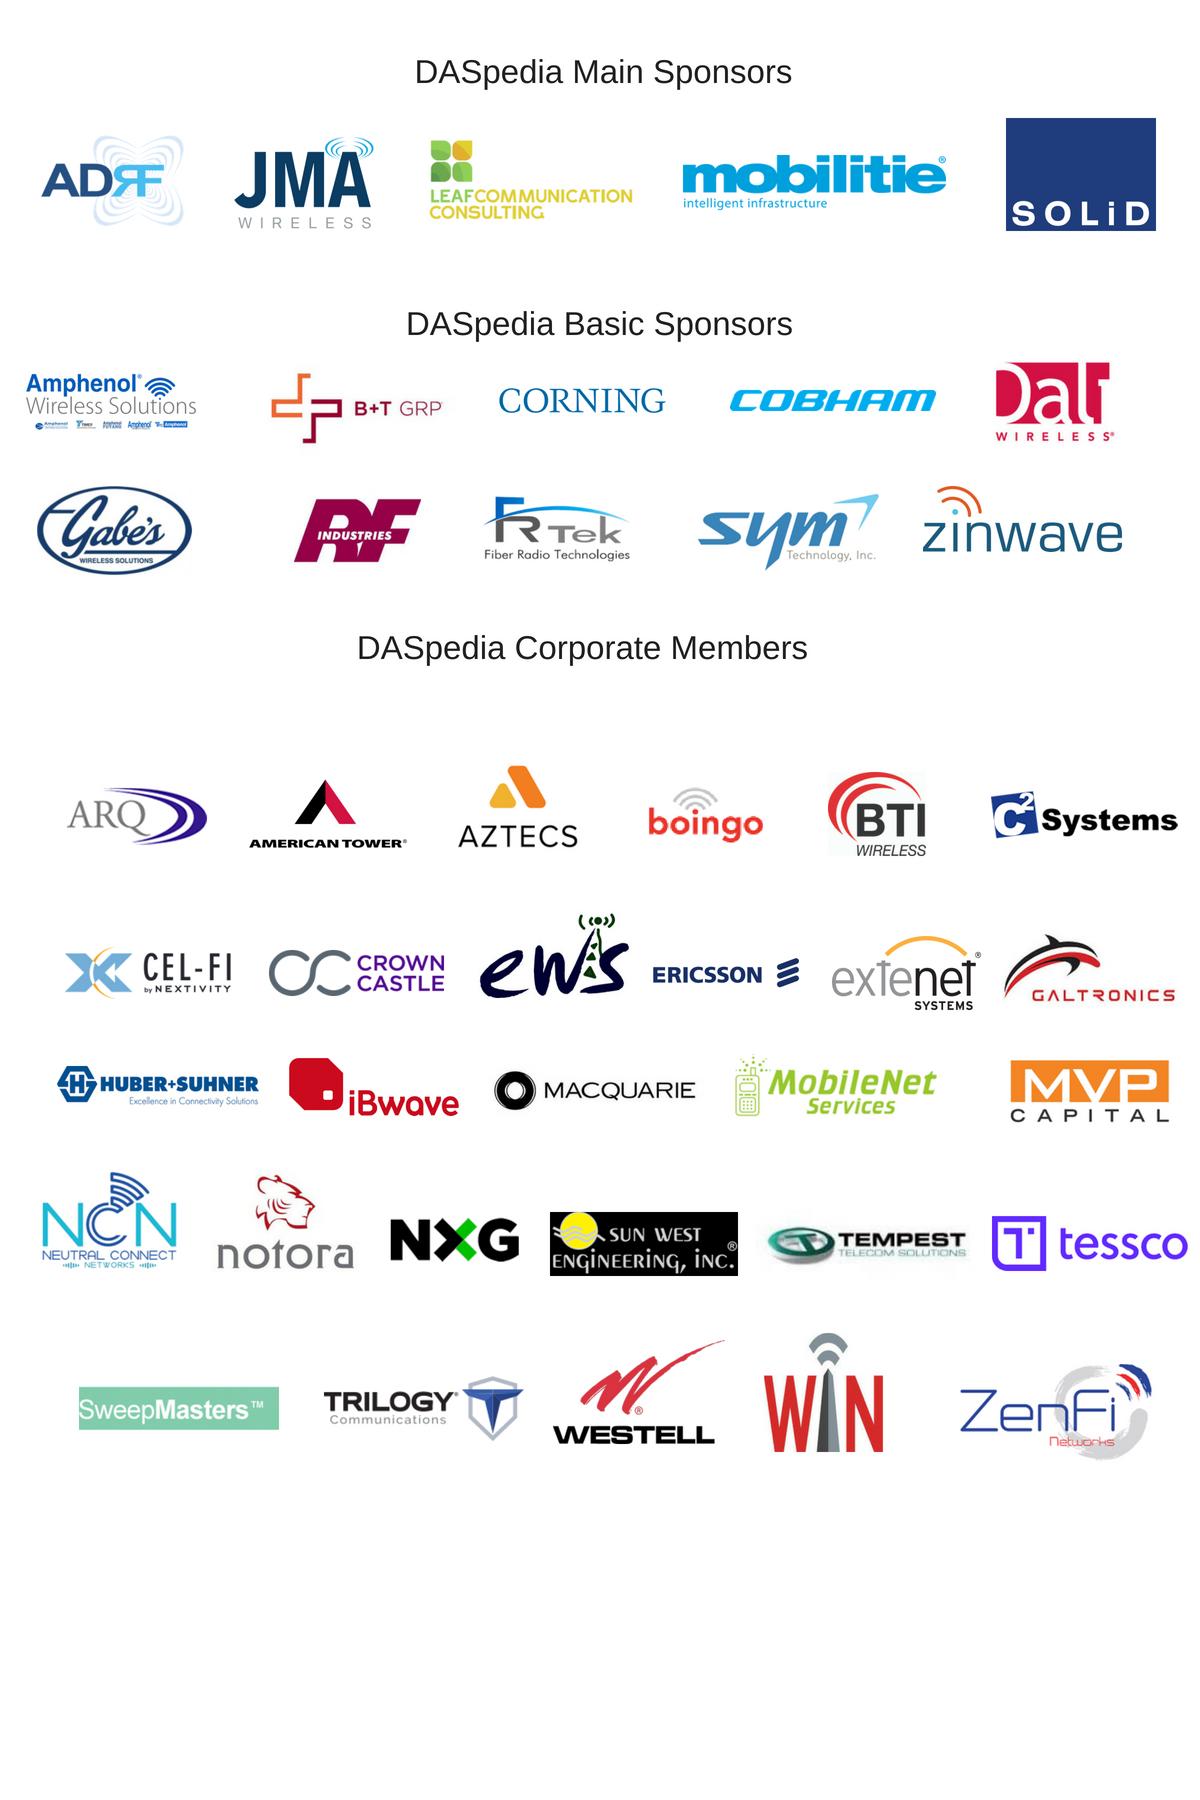 DASpedia NFOC sponsors